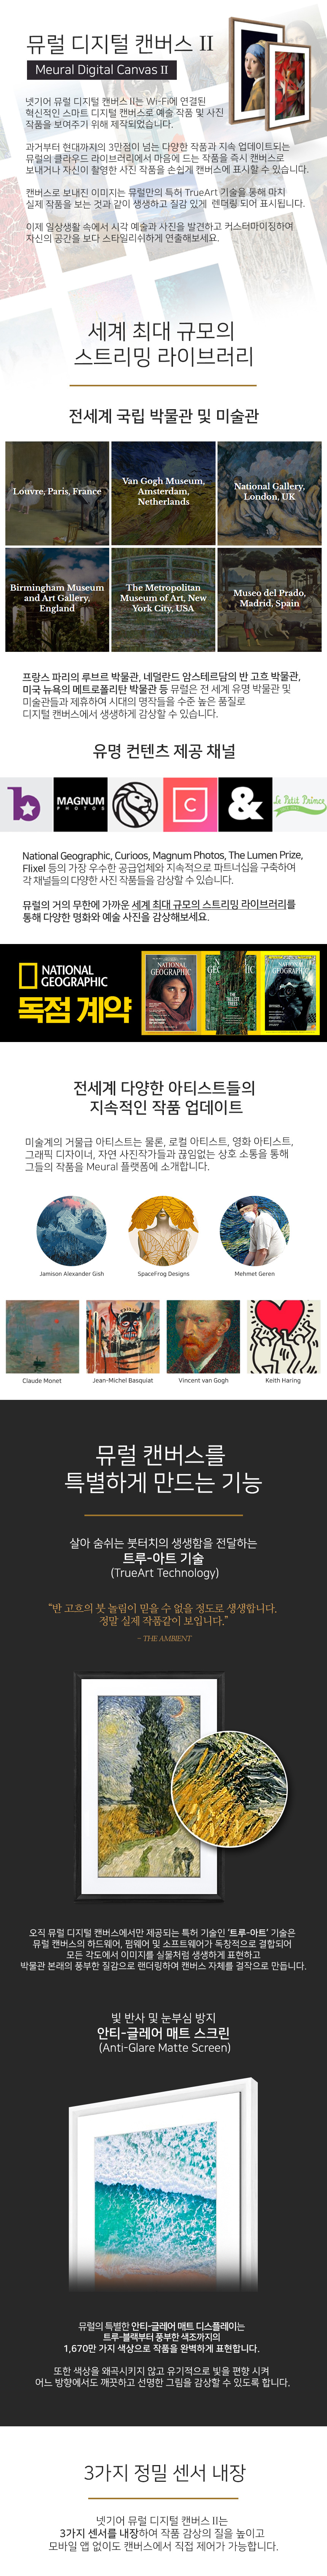 Meural_Catalog_01_03